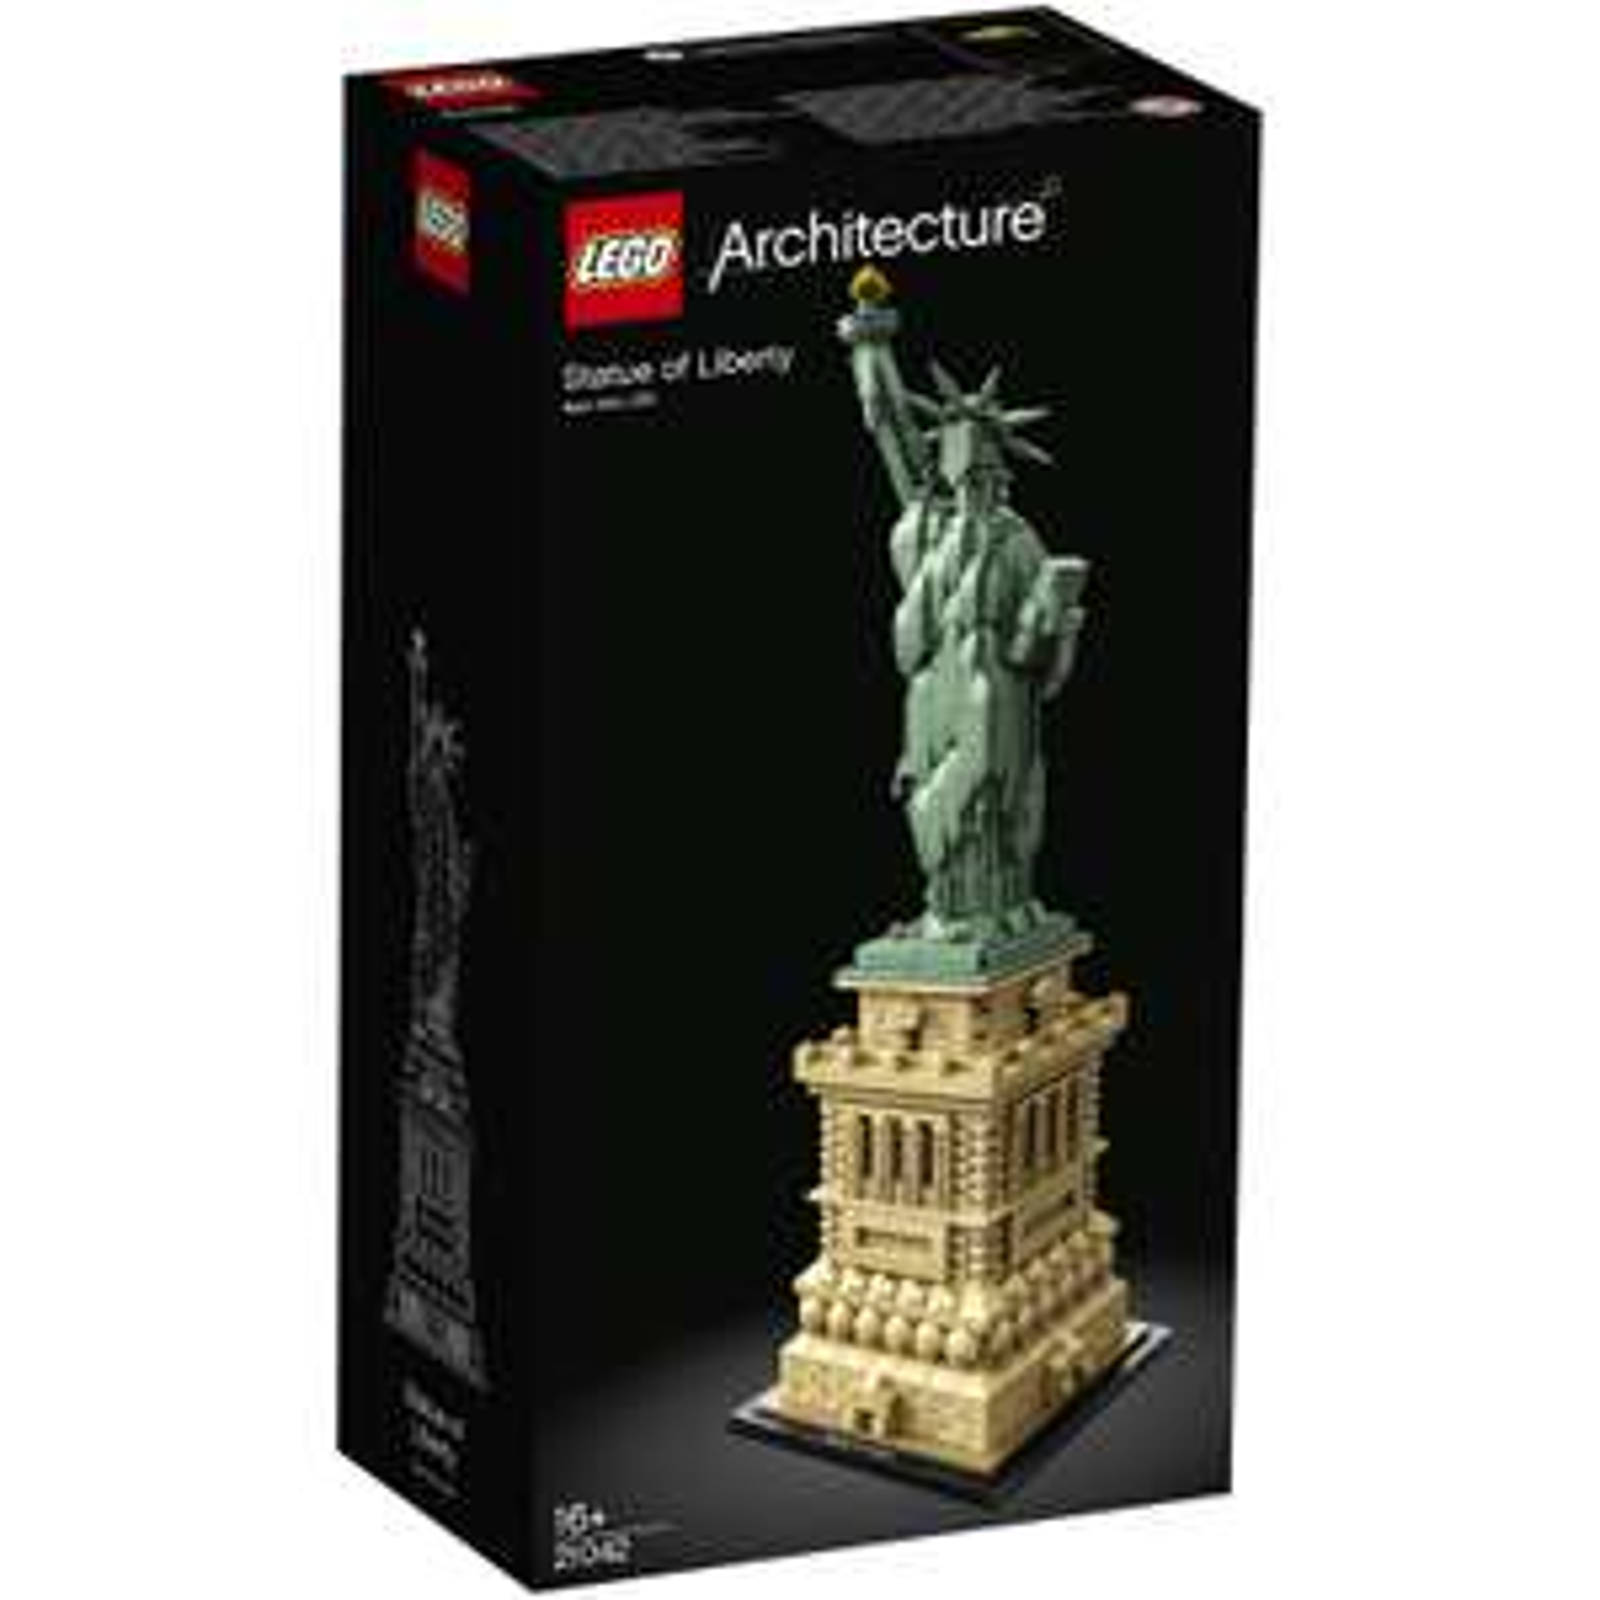 LEGO Architecture: Statue of Liberty Building Set (21042) £66.95 delivered @ Zavvi